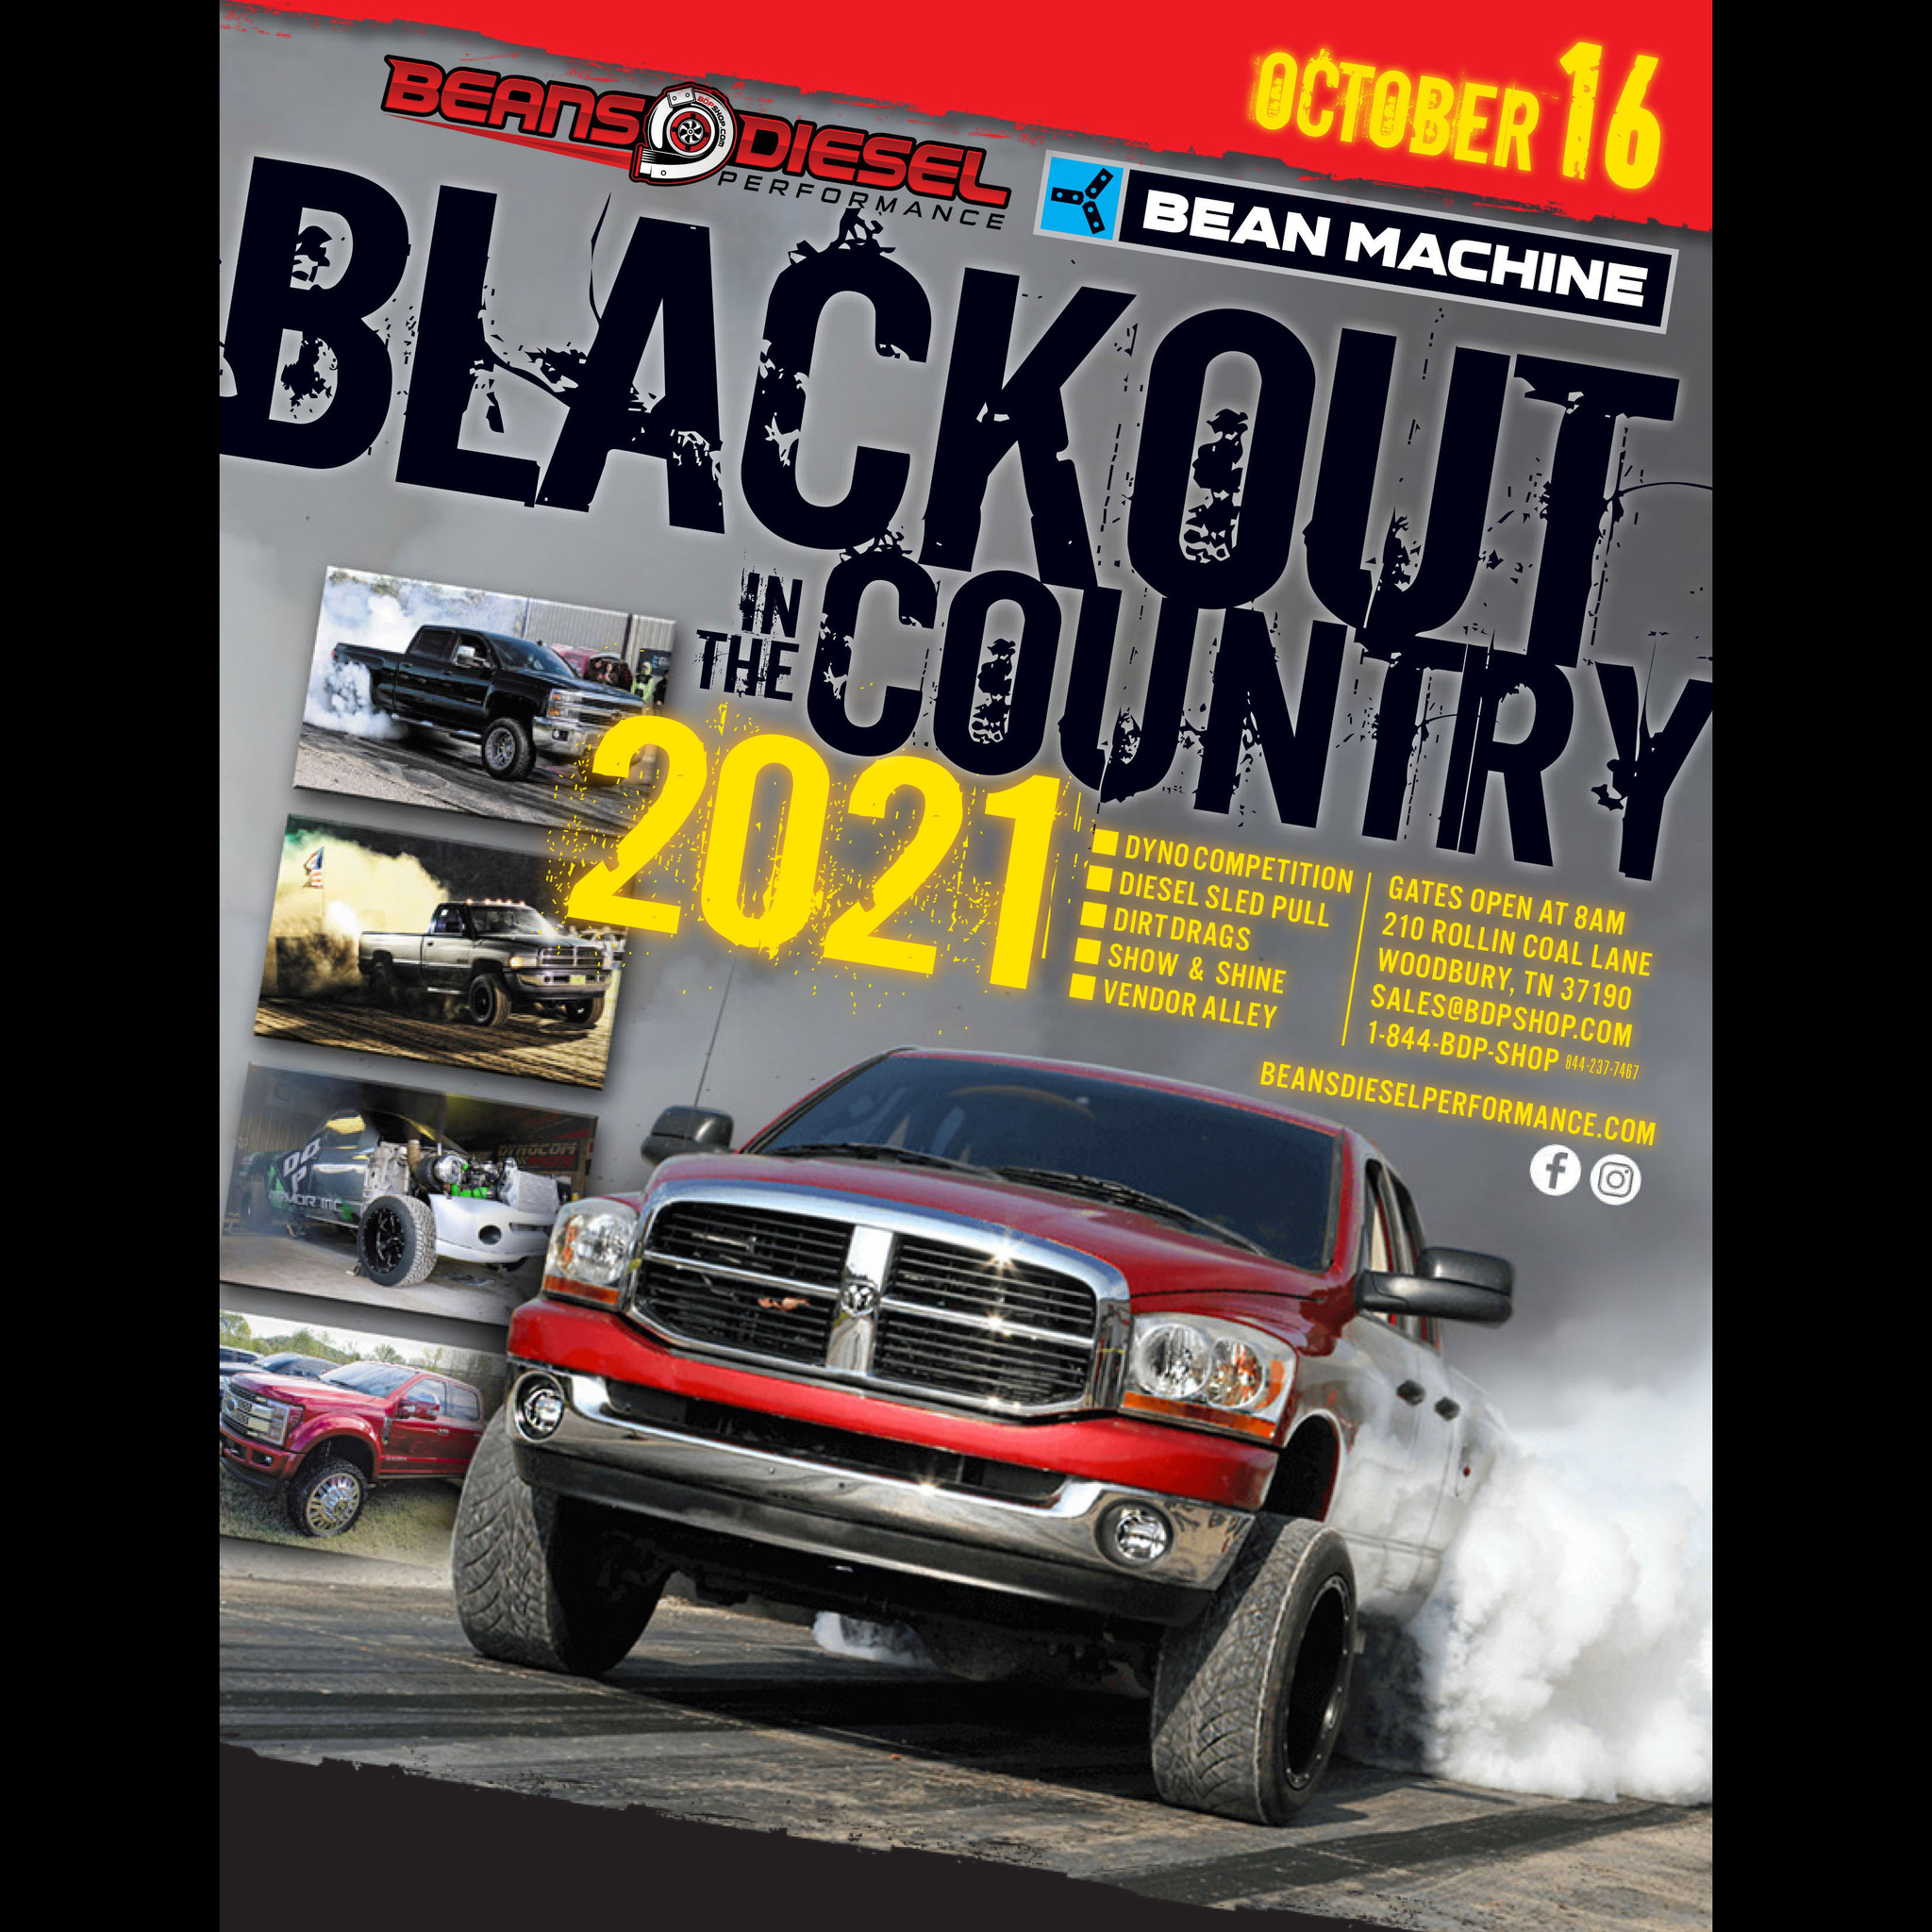 BLACKOUT 2021 OCTOBER 16TH